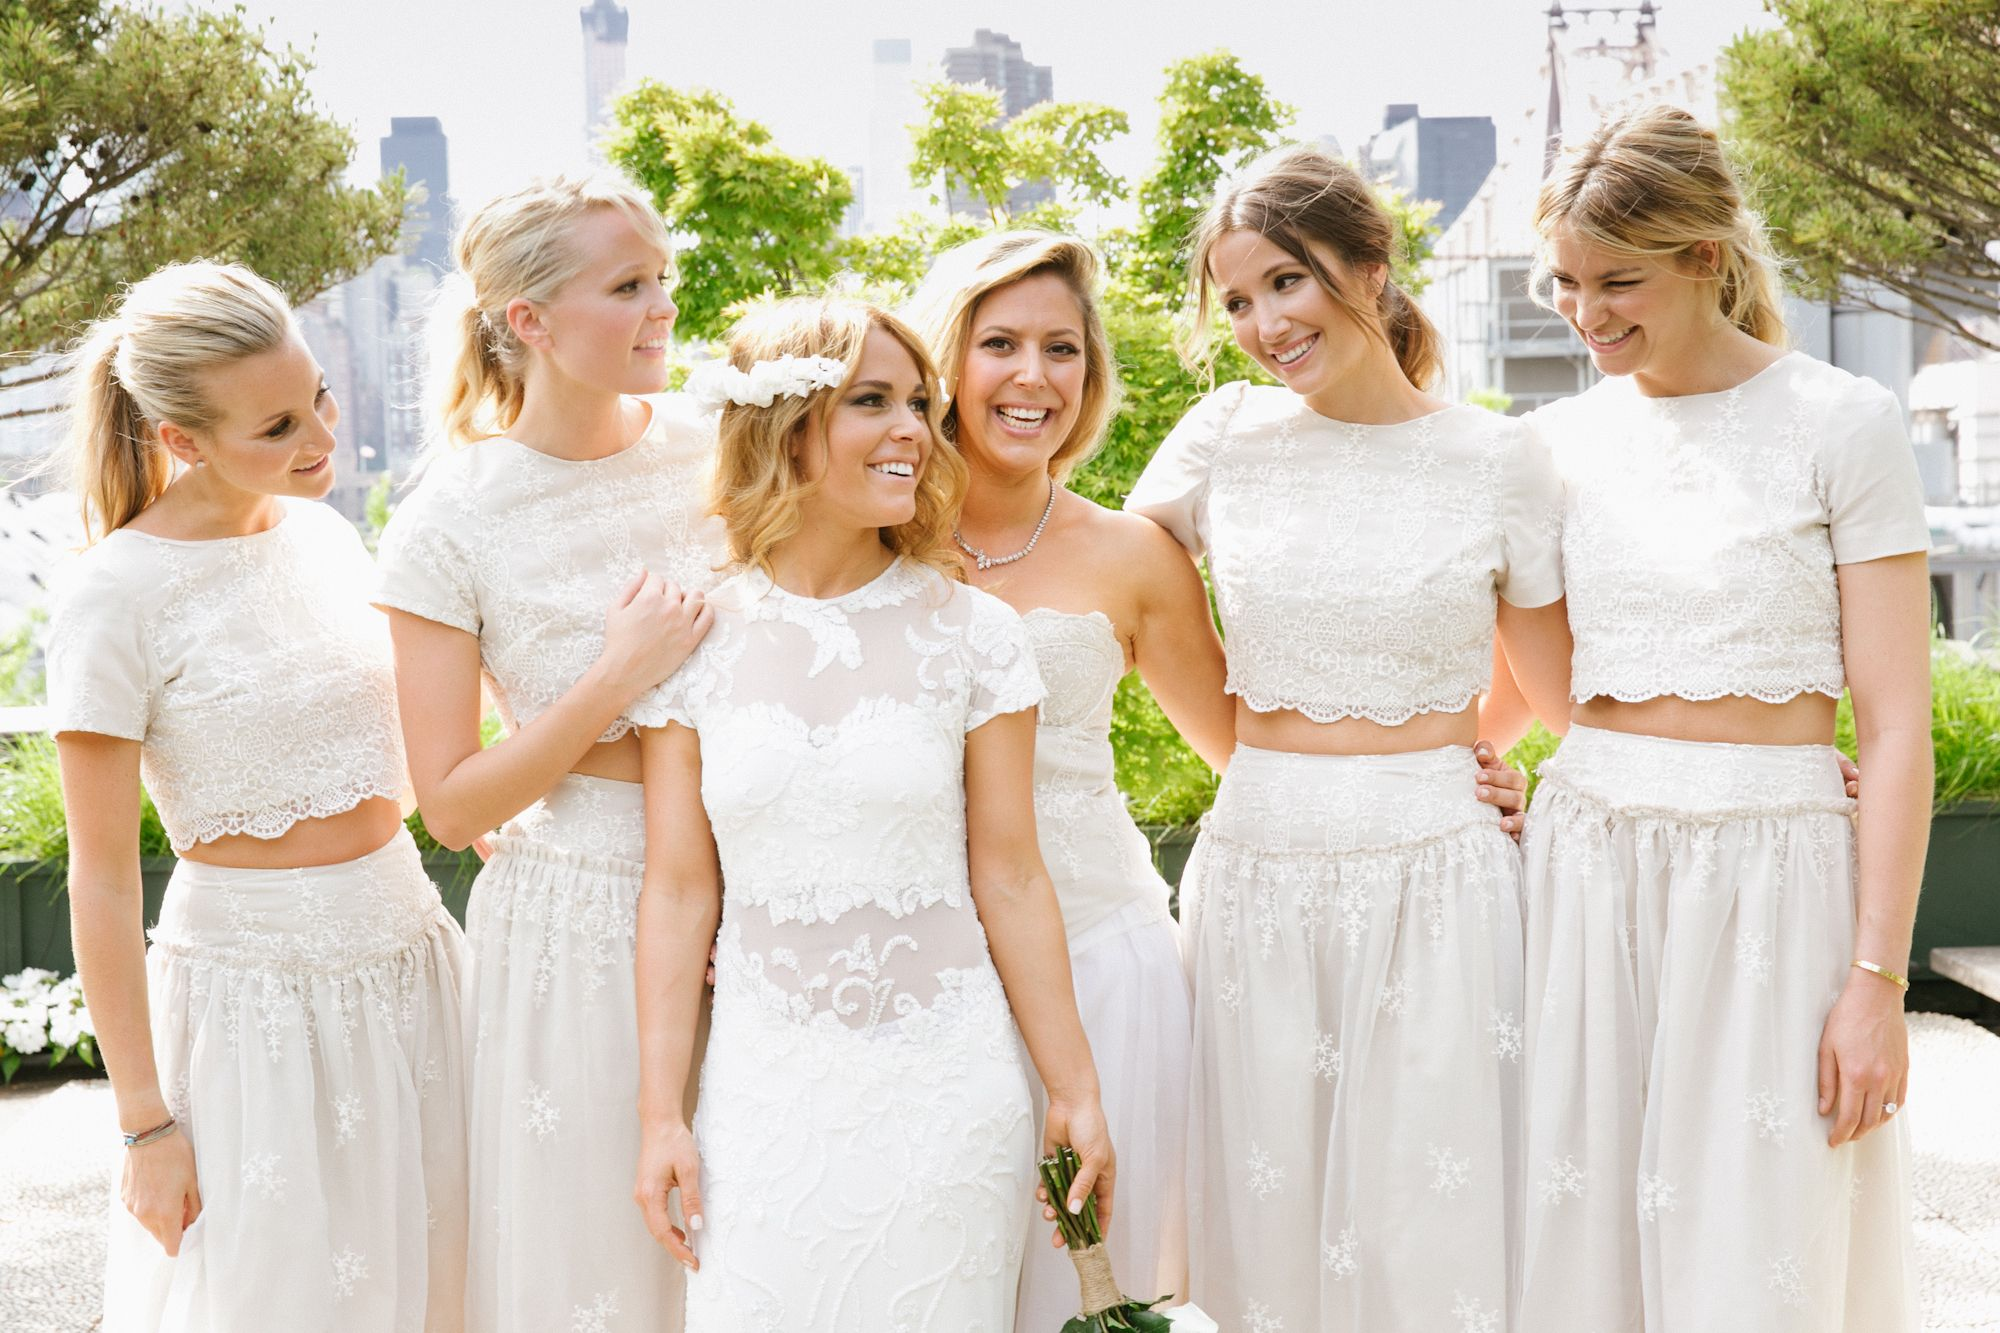 Bohemian bridesmaid dresses weddings bride to be pinterest bohemian bridesmaid dresses weddings ombrellifo Gallery